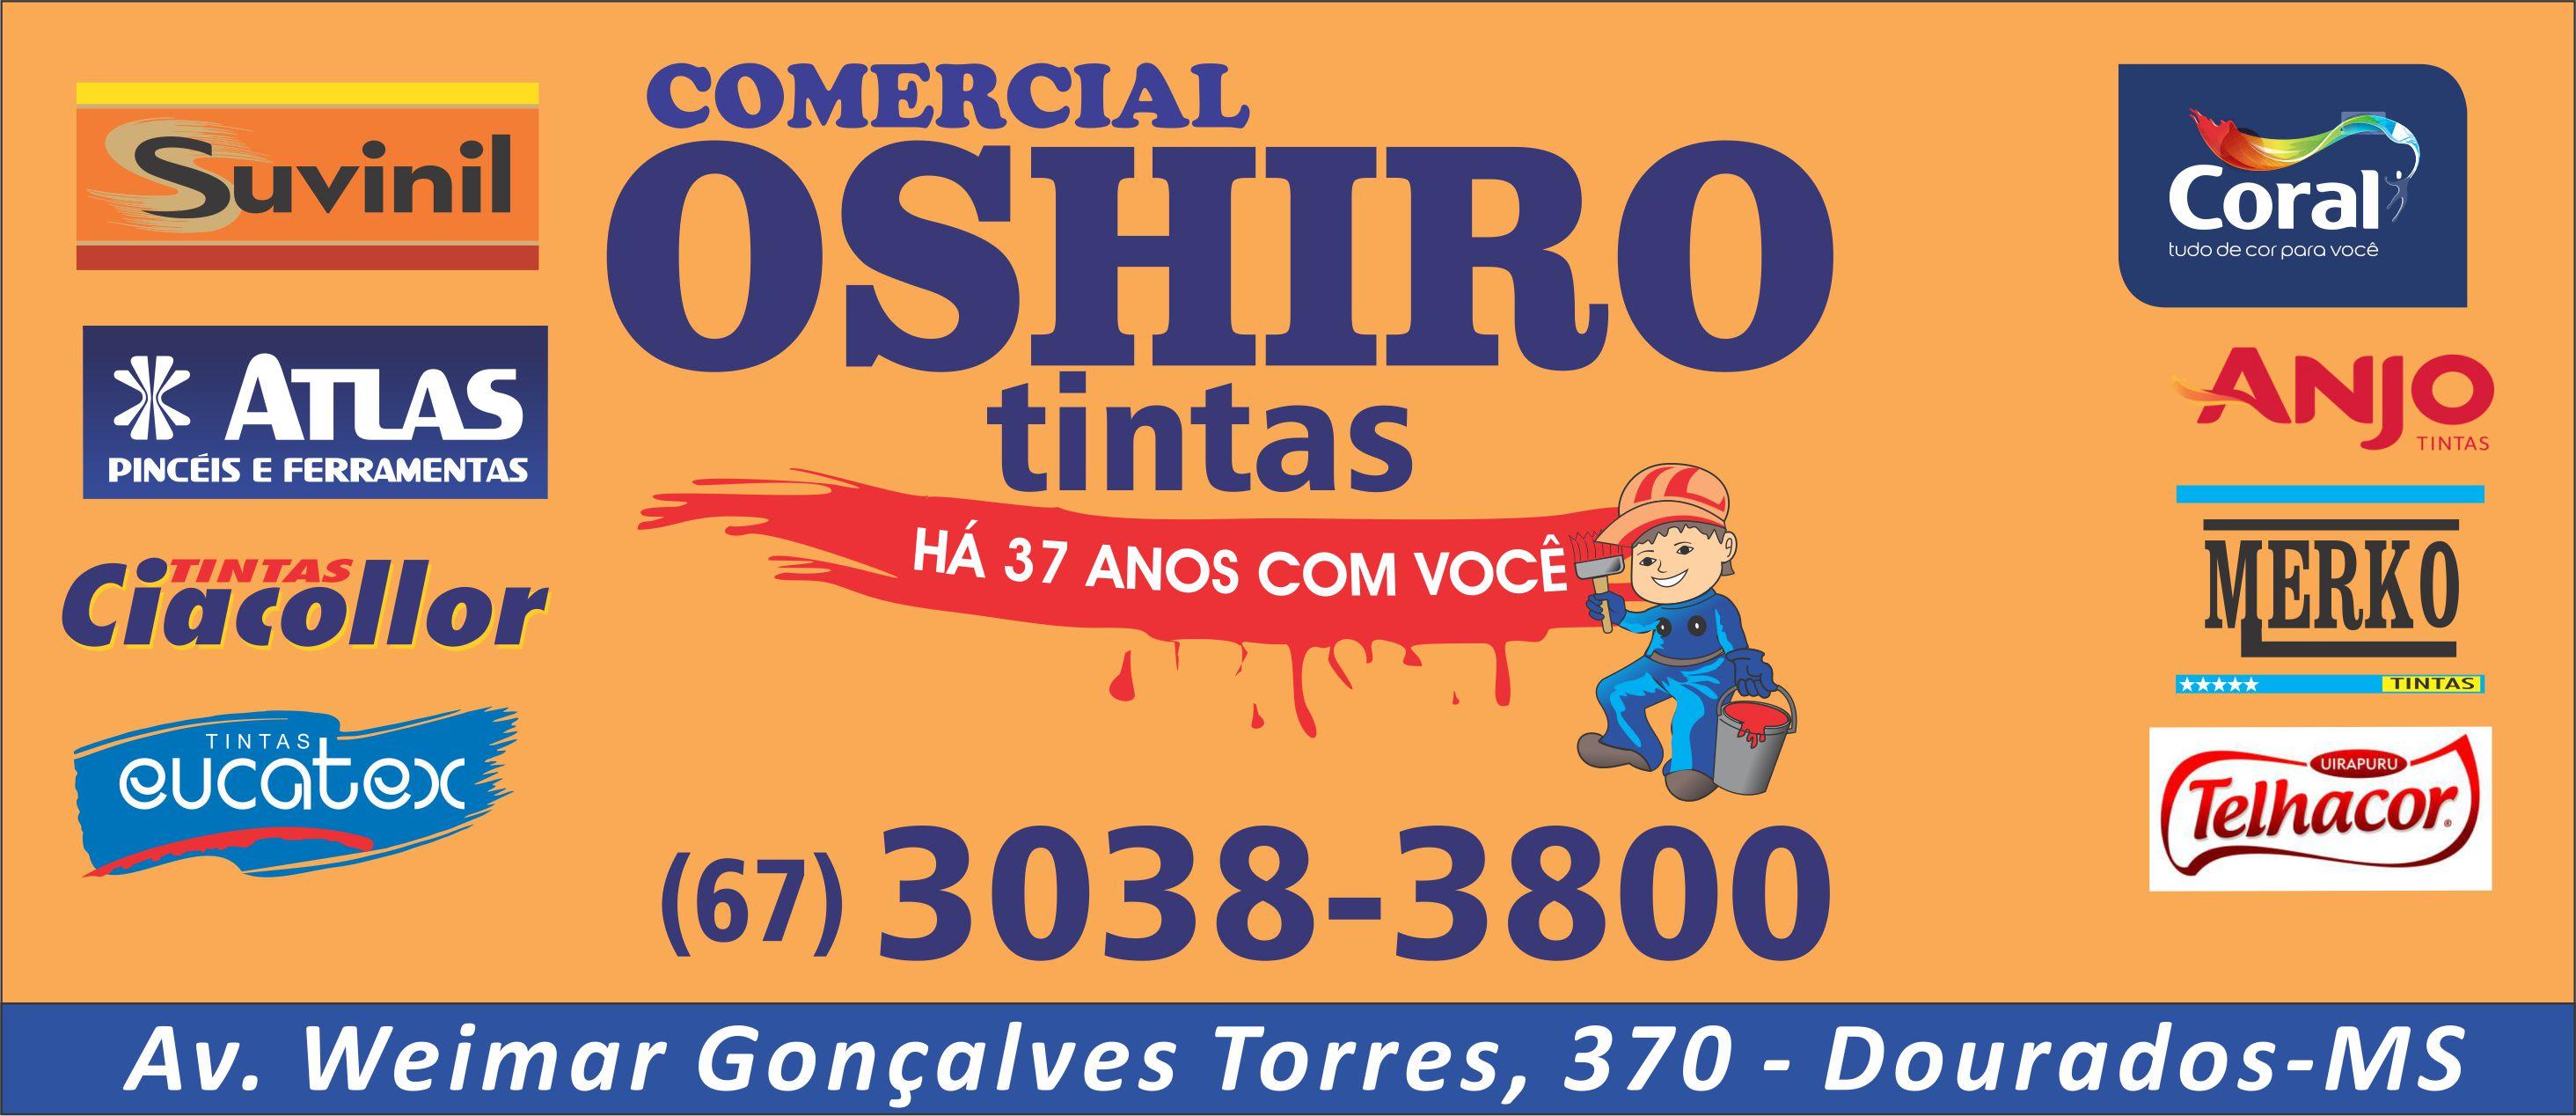 360x310 (3) Comercial Oshiro